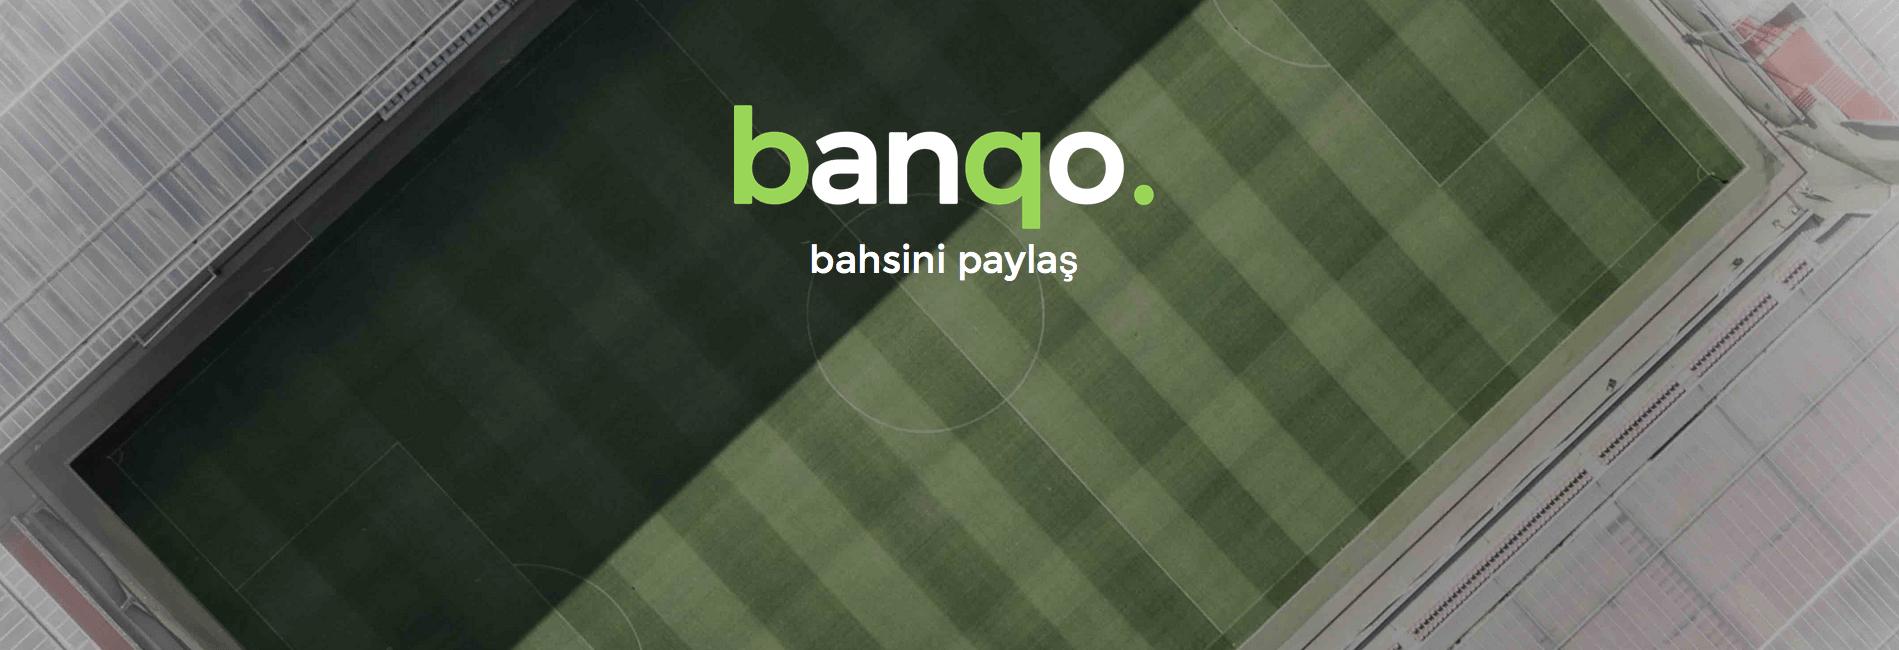 banqo-gorsel